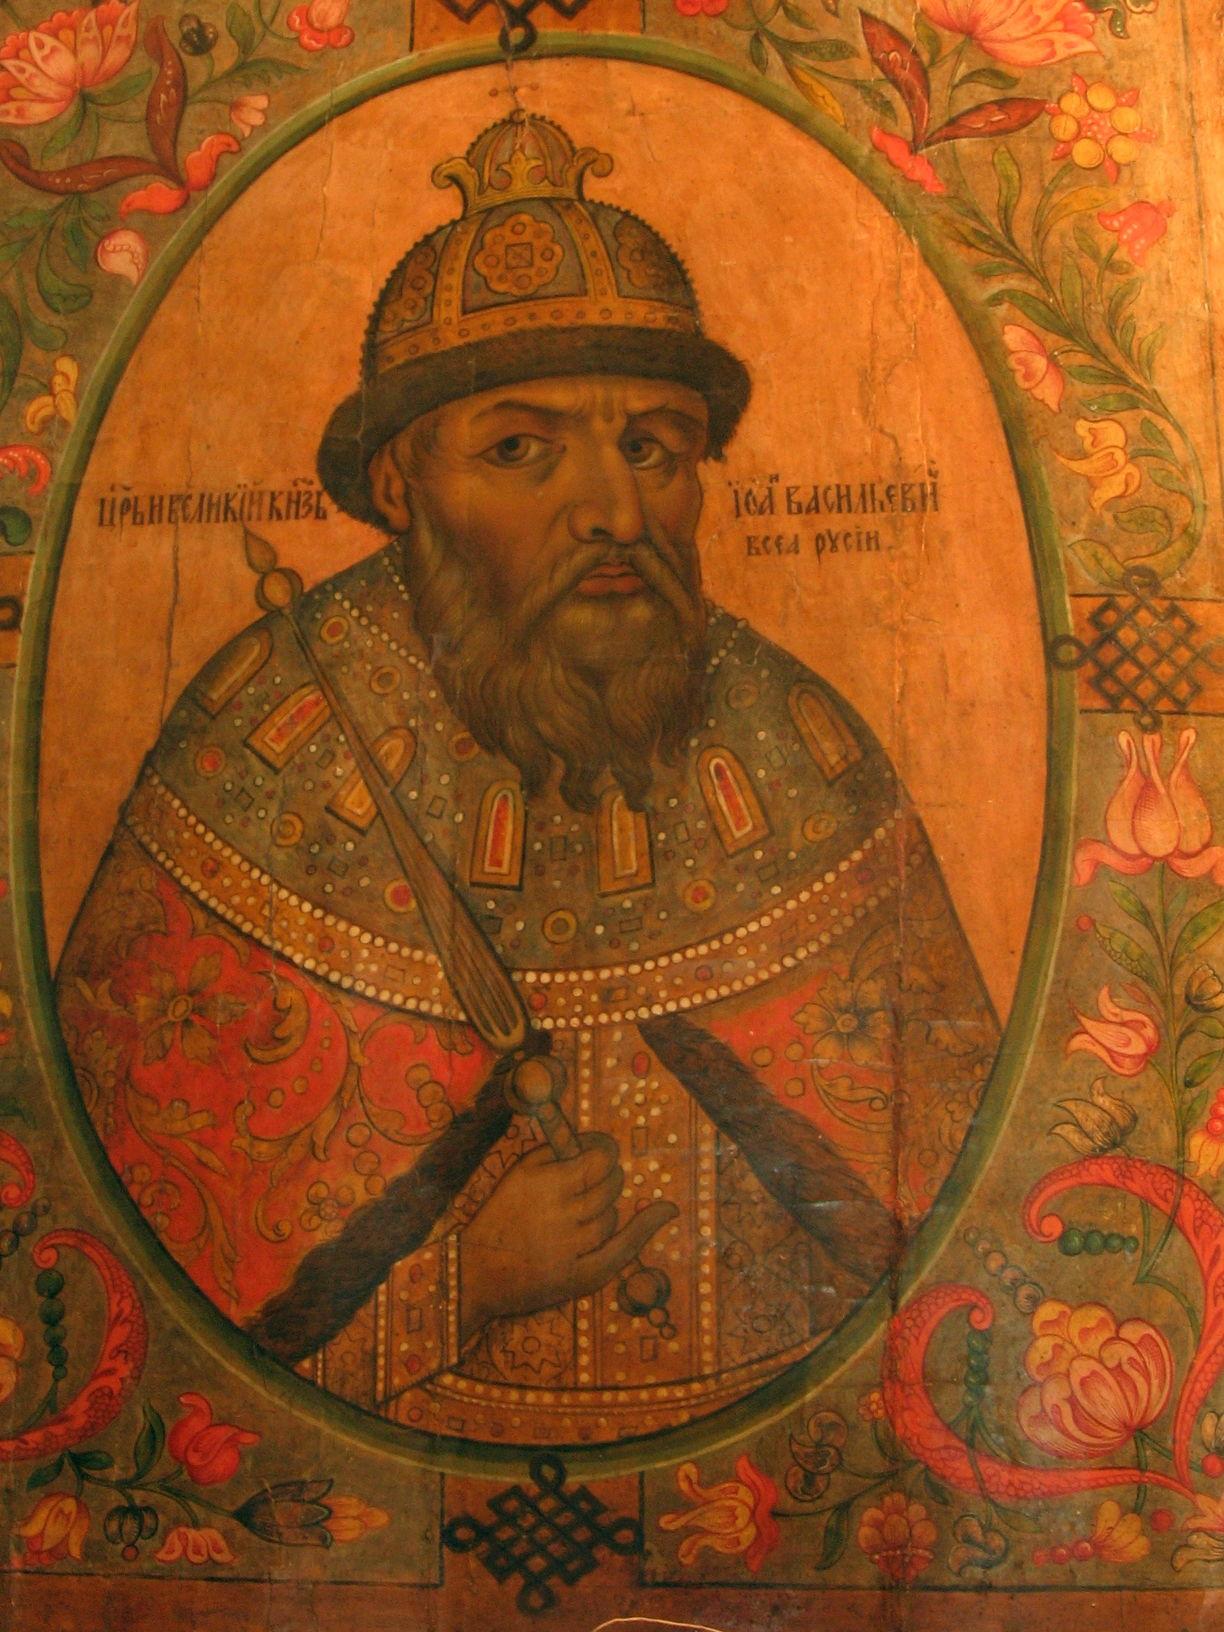 Е.И. Брягин. Портрет царя Ивана IV Васильевича